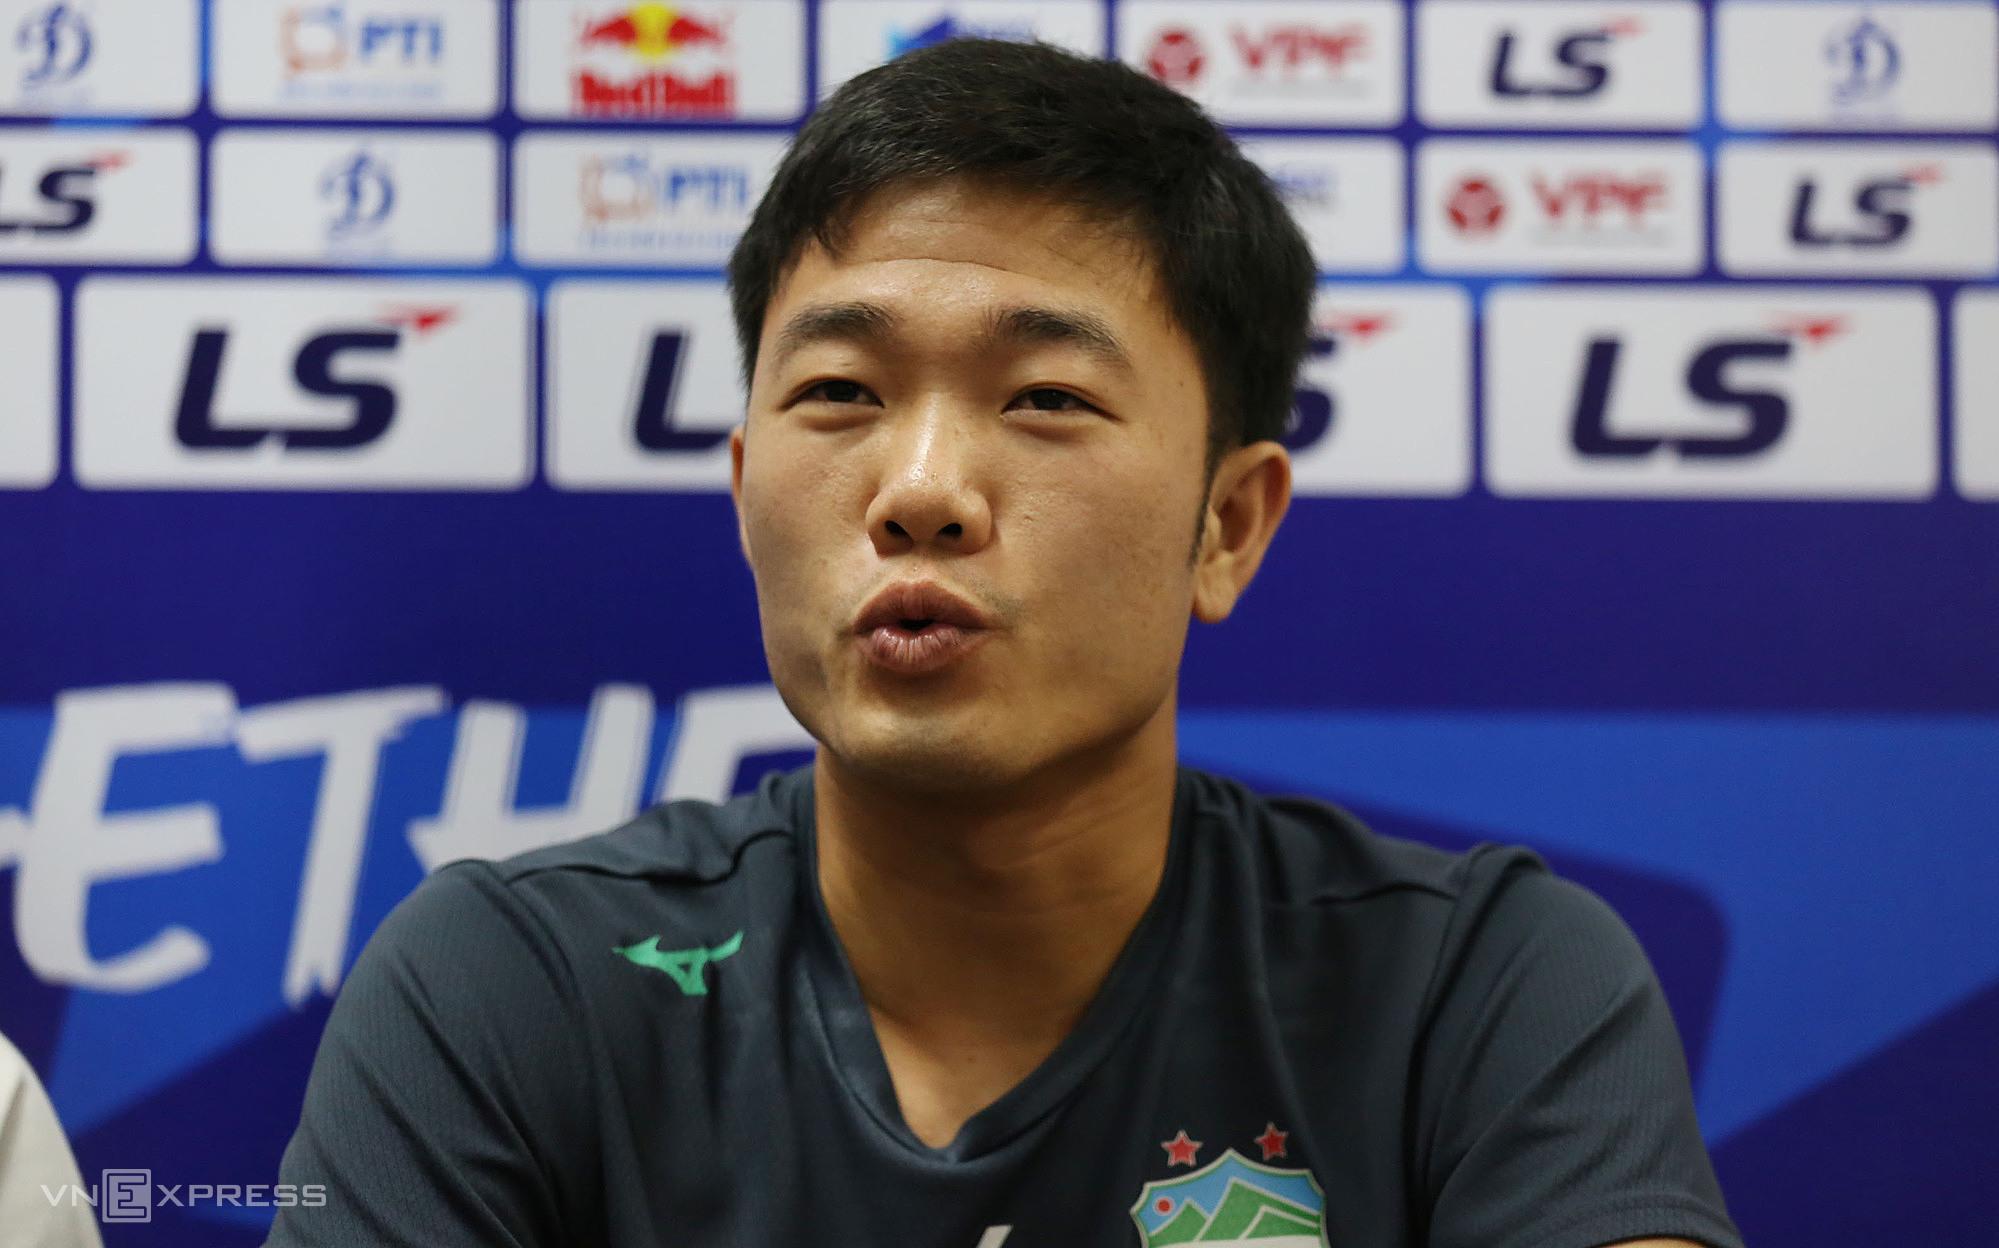 Gelandang Luong Xuan Truong berbagi cerita sebelum konfrontasi dengan klub Hanoi di putaran ke-10 V-League.  Foto: Duc Dong.